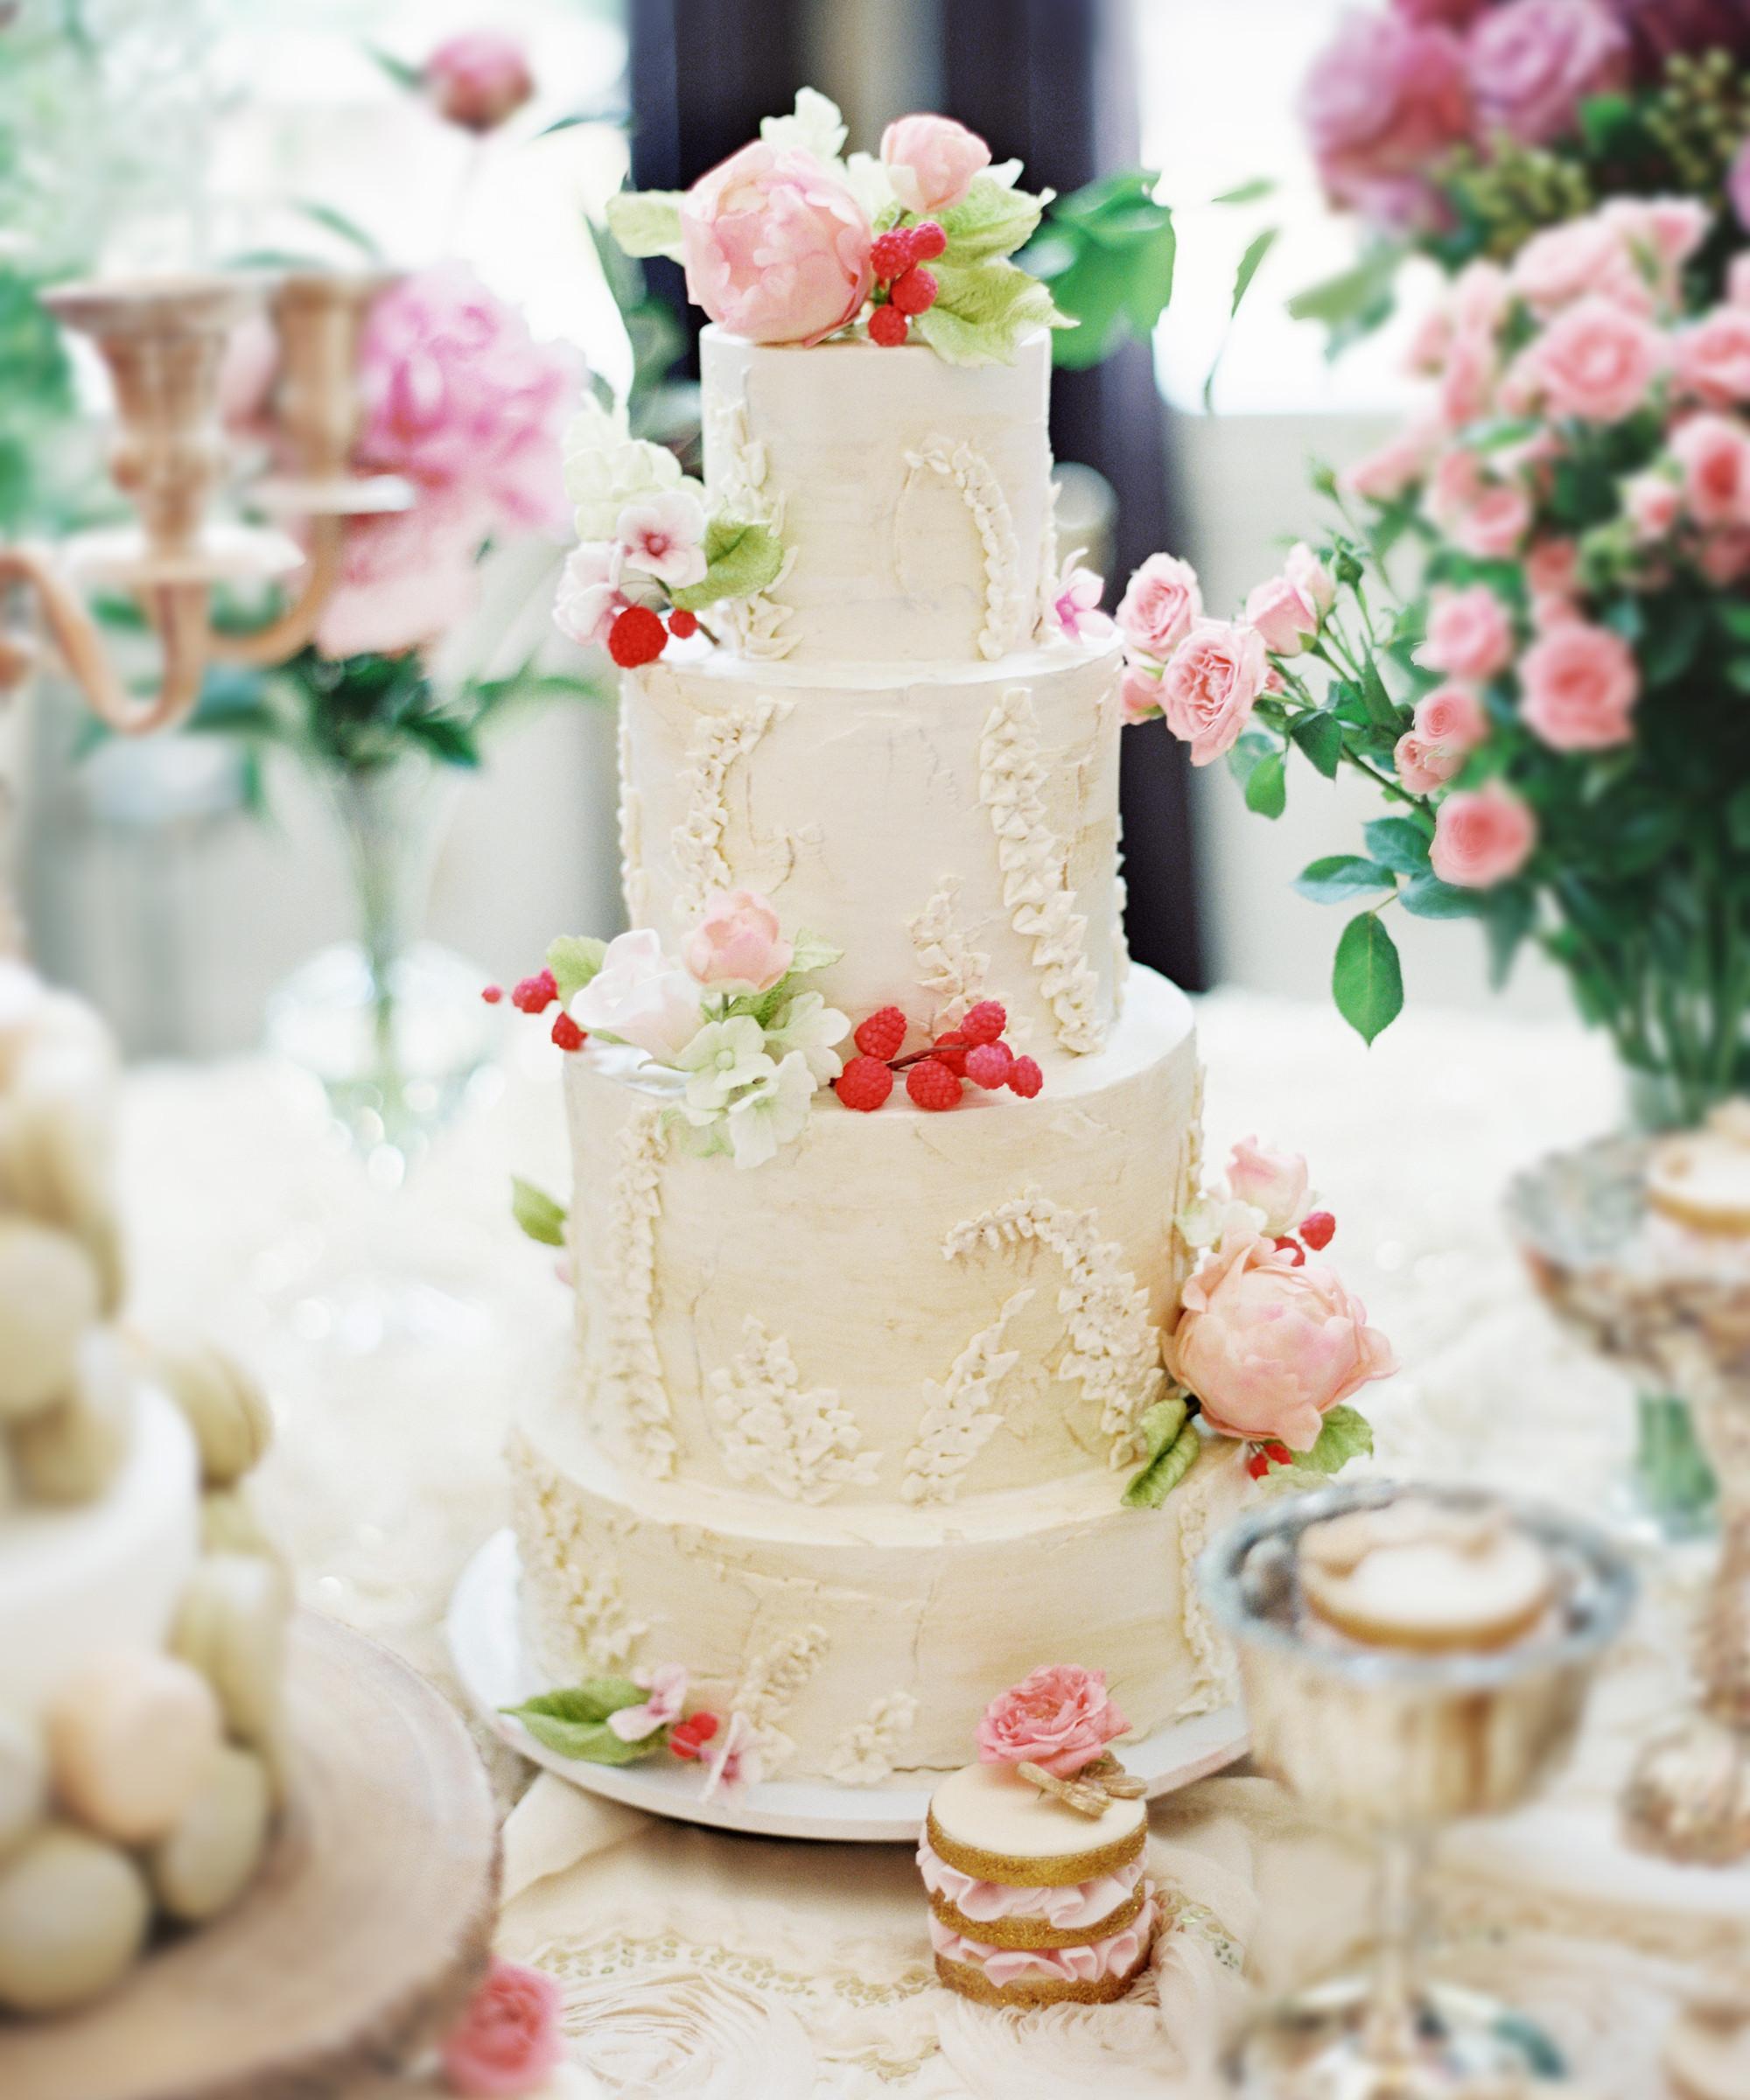 Wedding Cakes Pics  Vegan and Gluten Free Wedding Cake Ideas Alternative